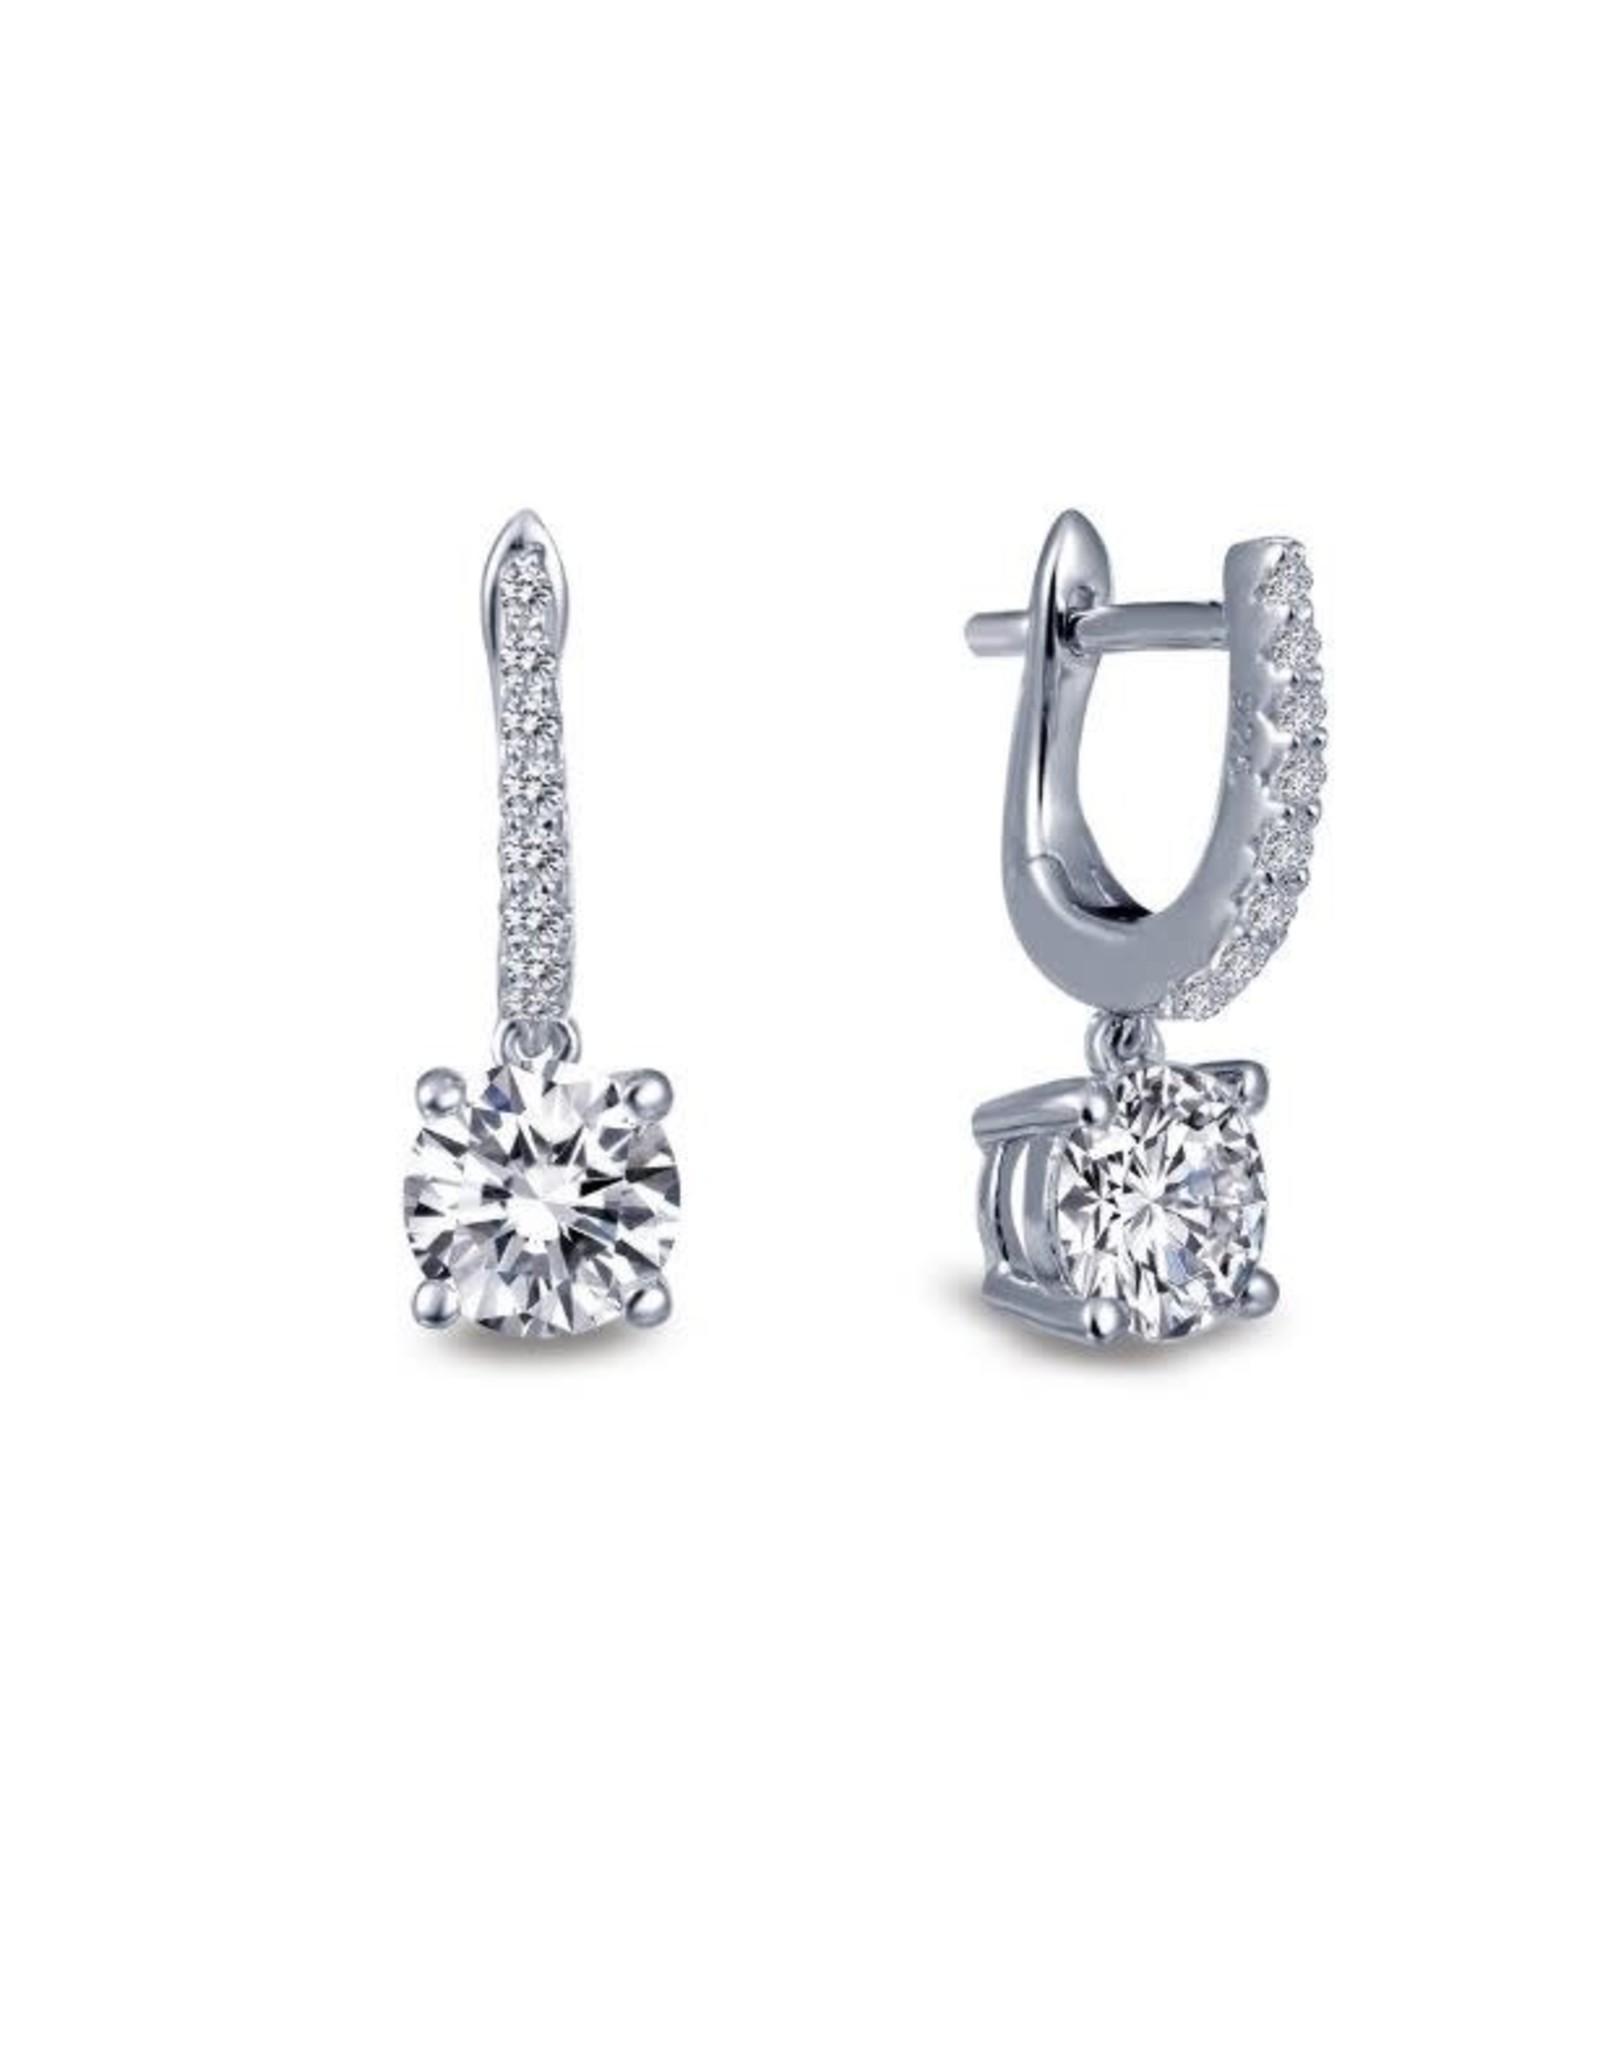 Silver Solitaire Zirconia Dangle Earrings, CZ: 1.86ct